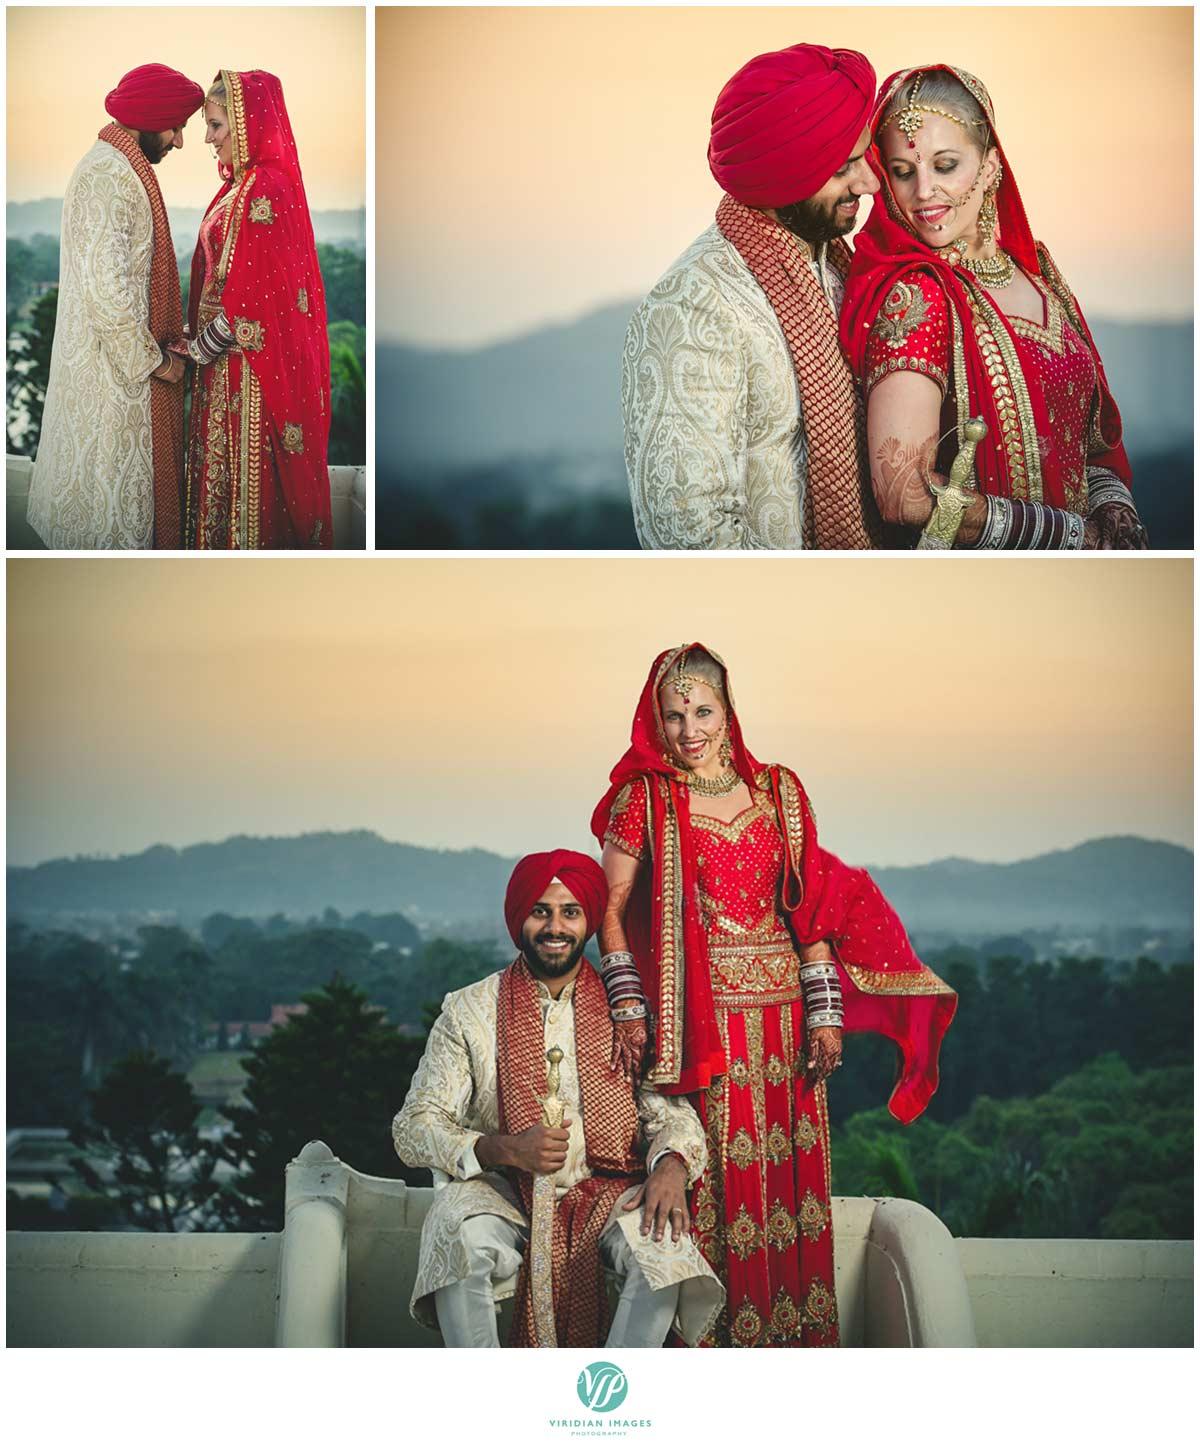 India_Pinjore_Garden_Bridal_Portraits_Viridian_Images_Photography_poto_4